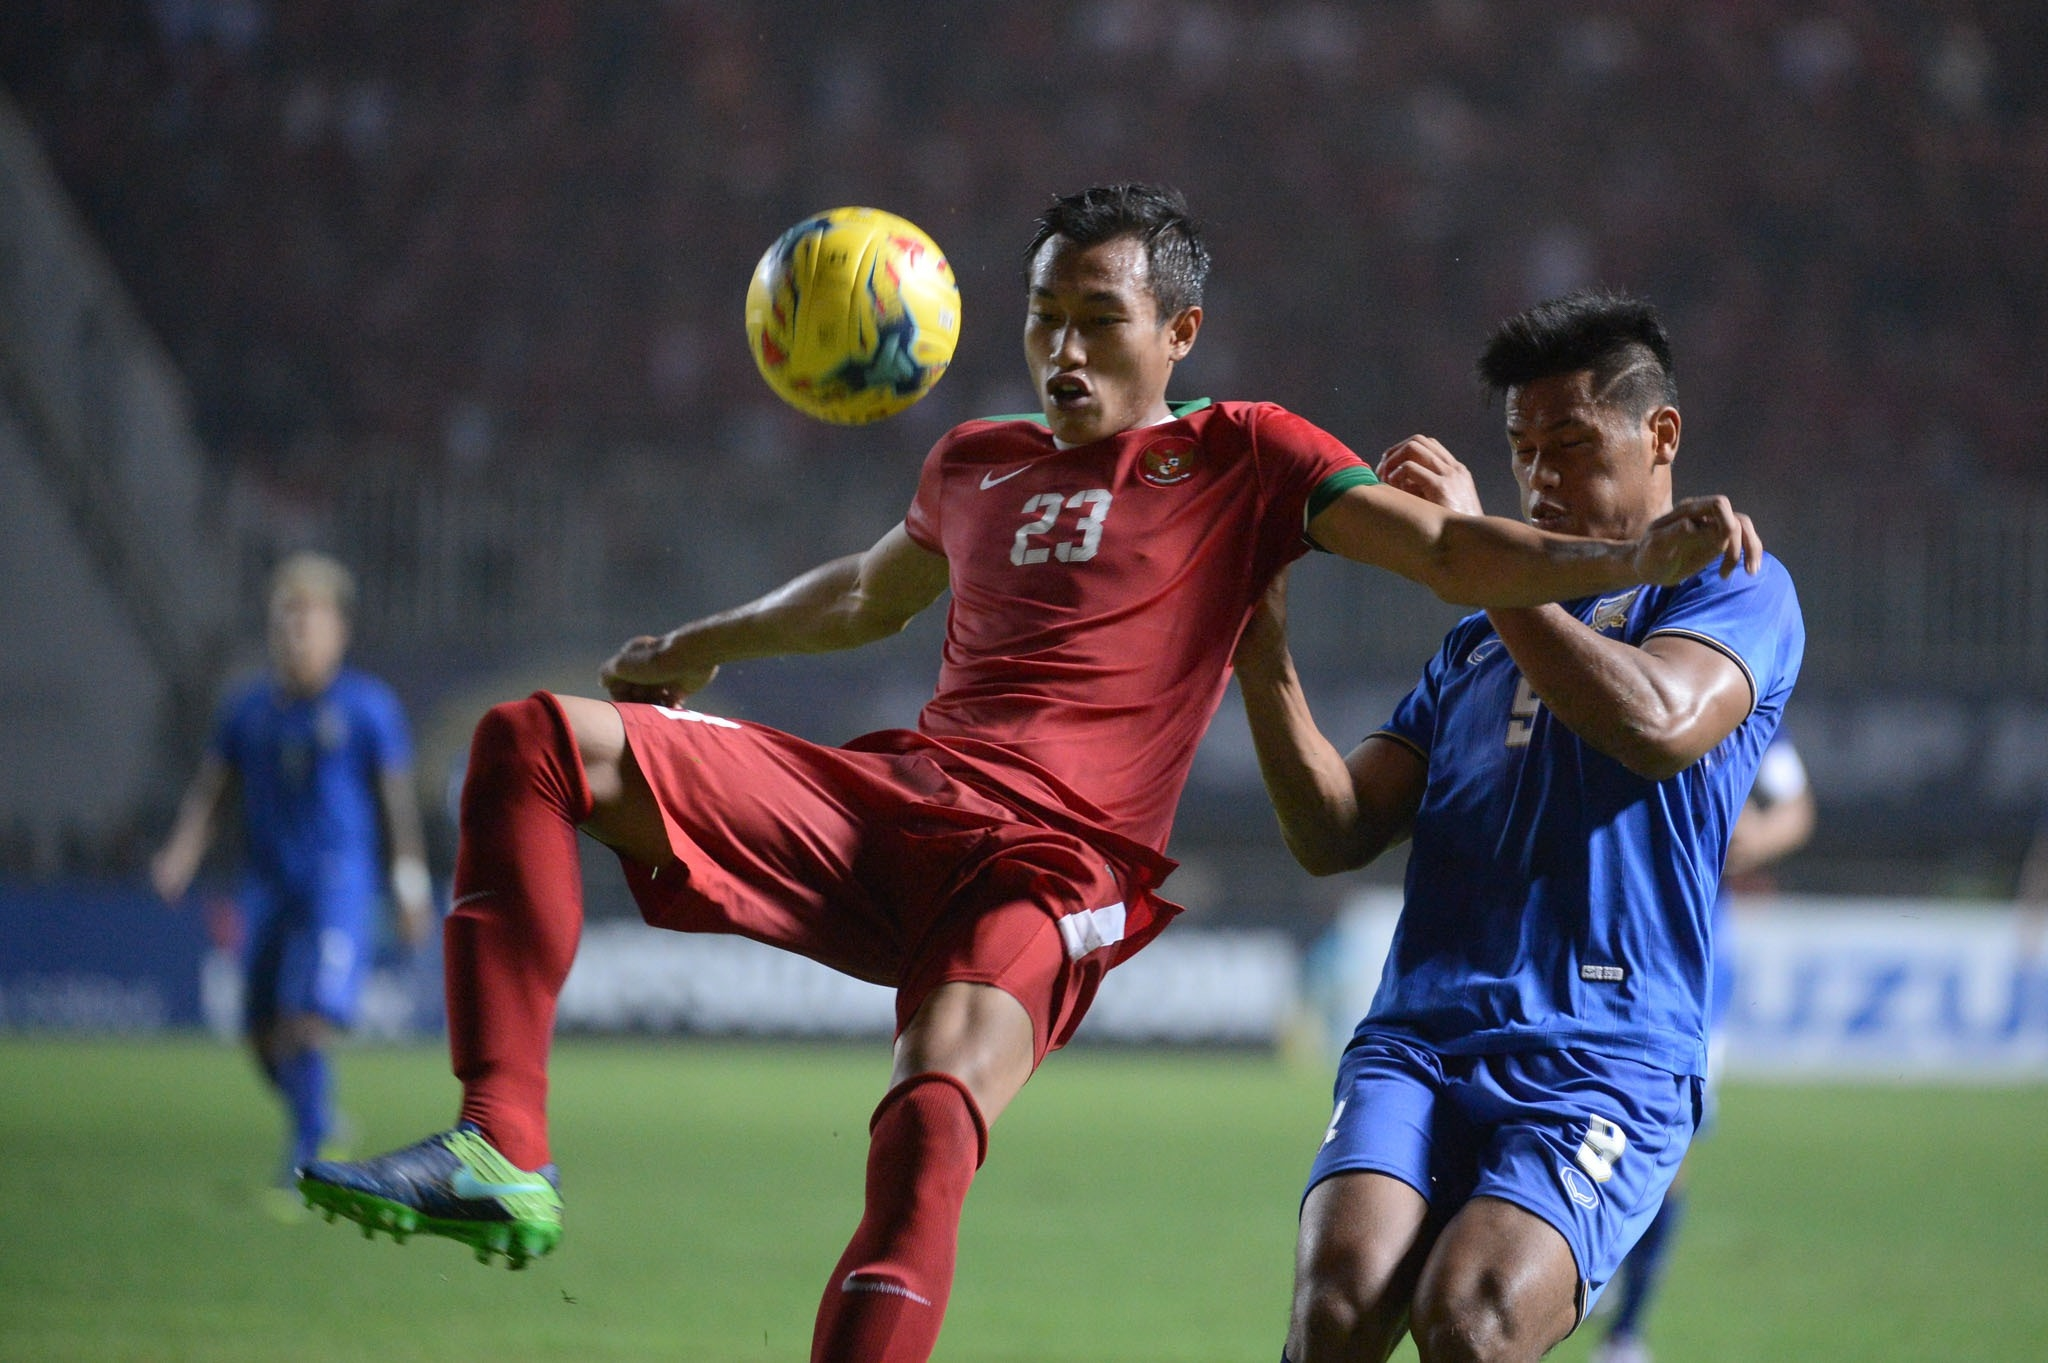 Hansamu Yama - Indonesia & Sirach Chanttong - Thailand AFF Suzuki Cup 2016